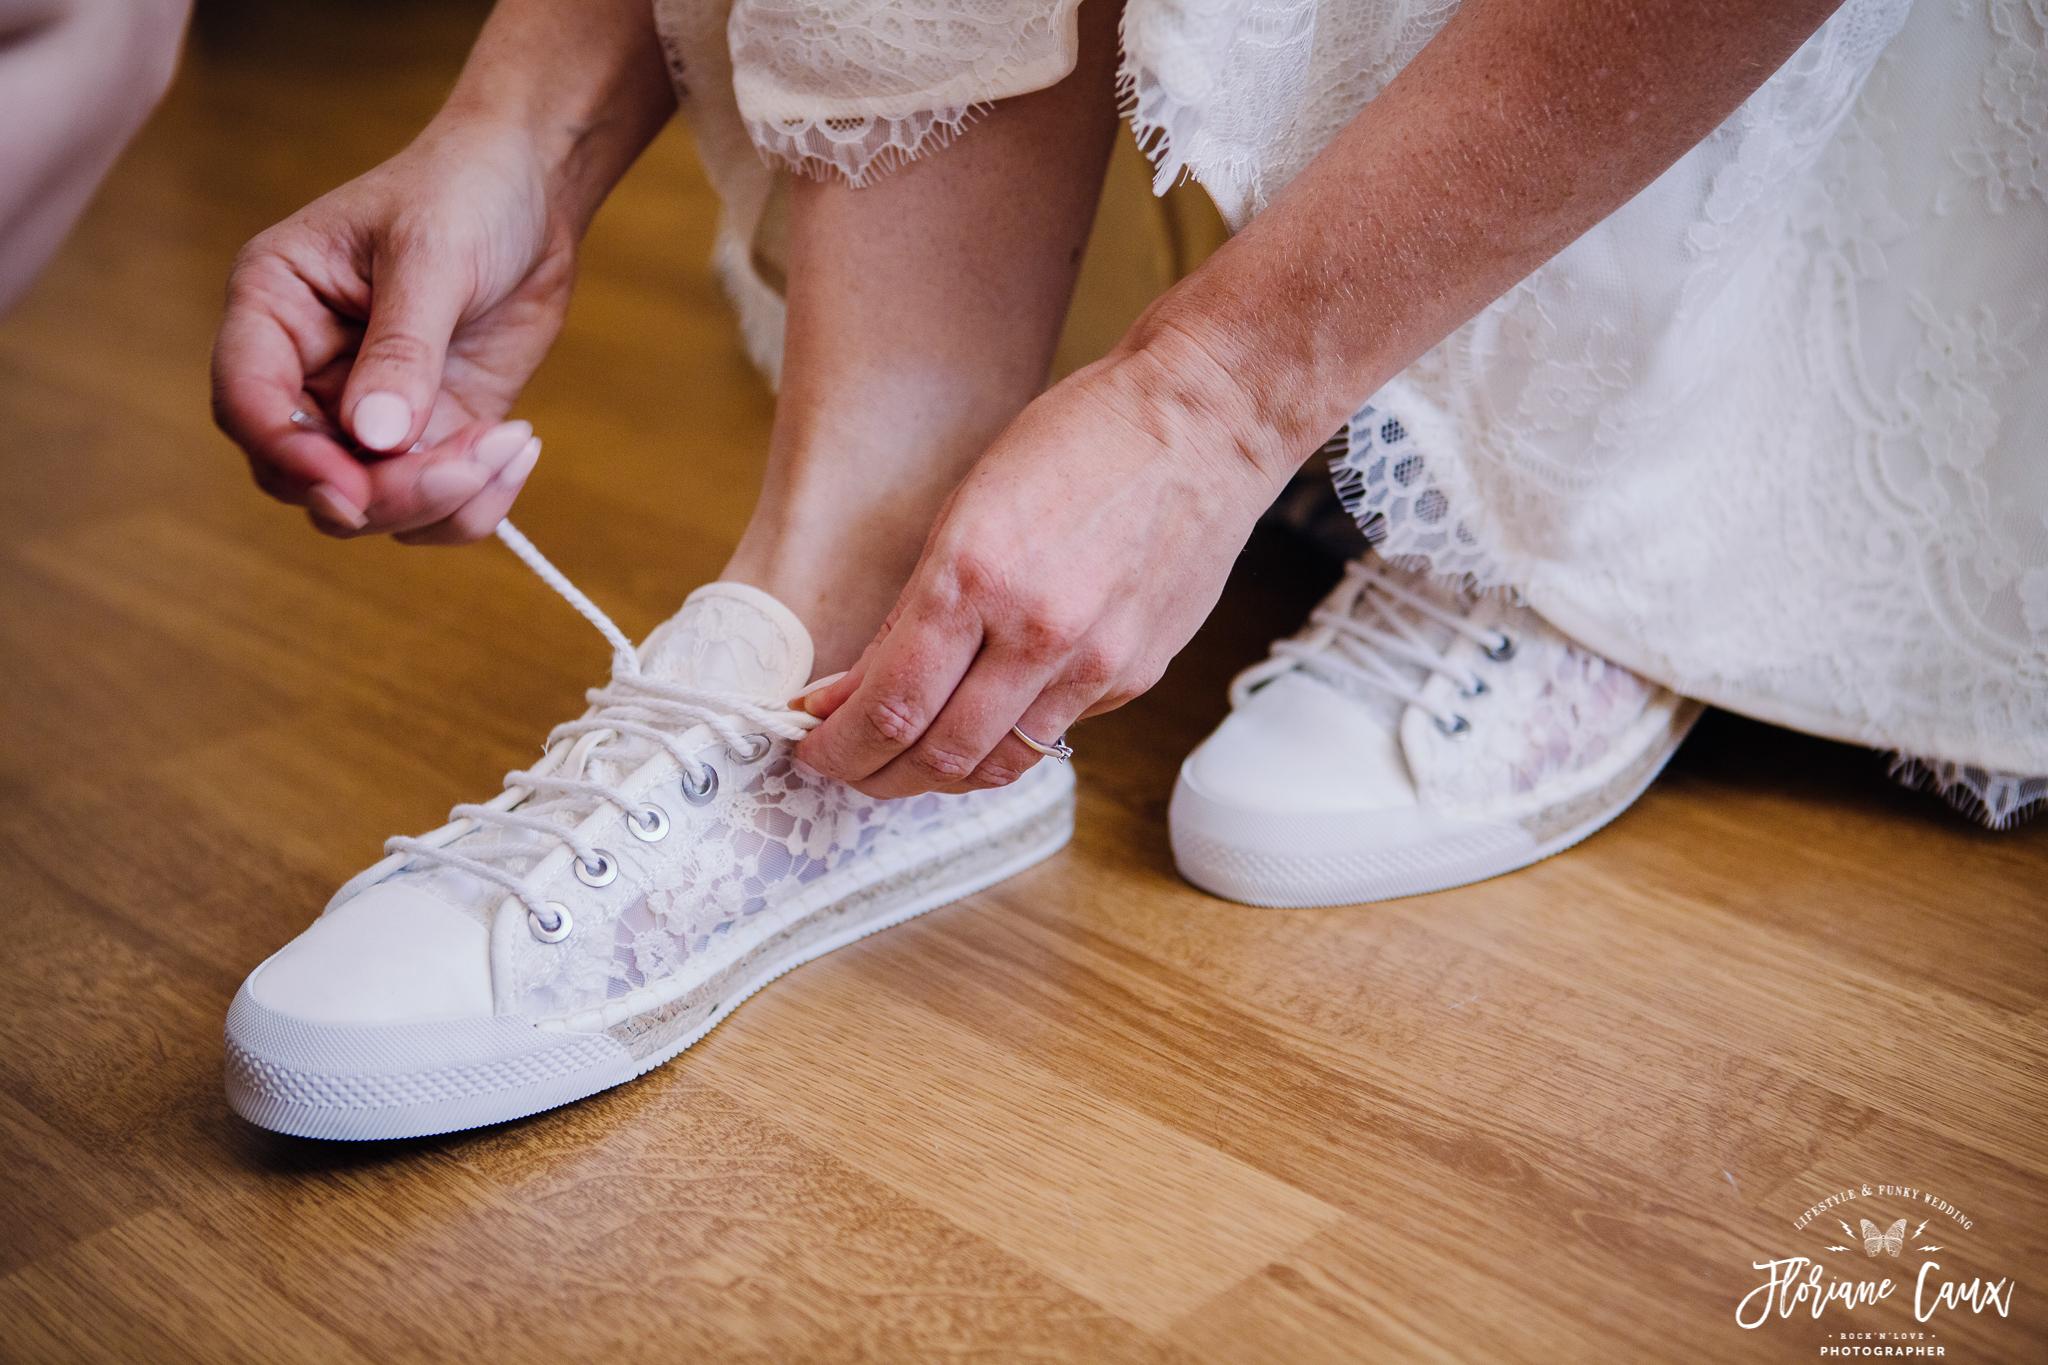 photographe-mariage-toulouse-rocknroll-maries-tatoues-floriane-caux-13